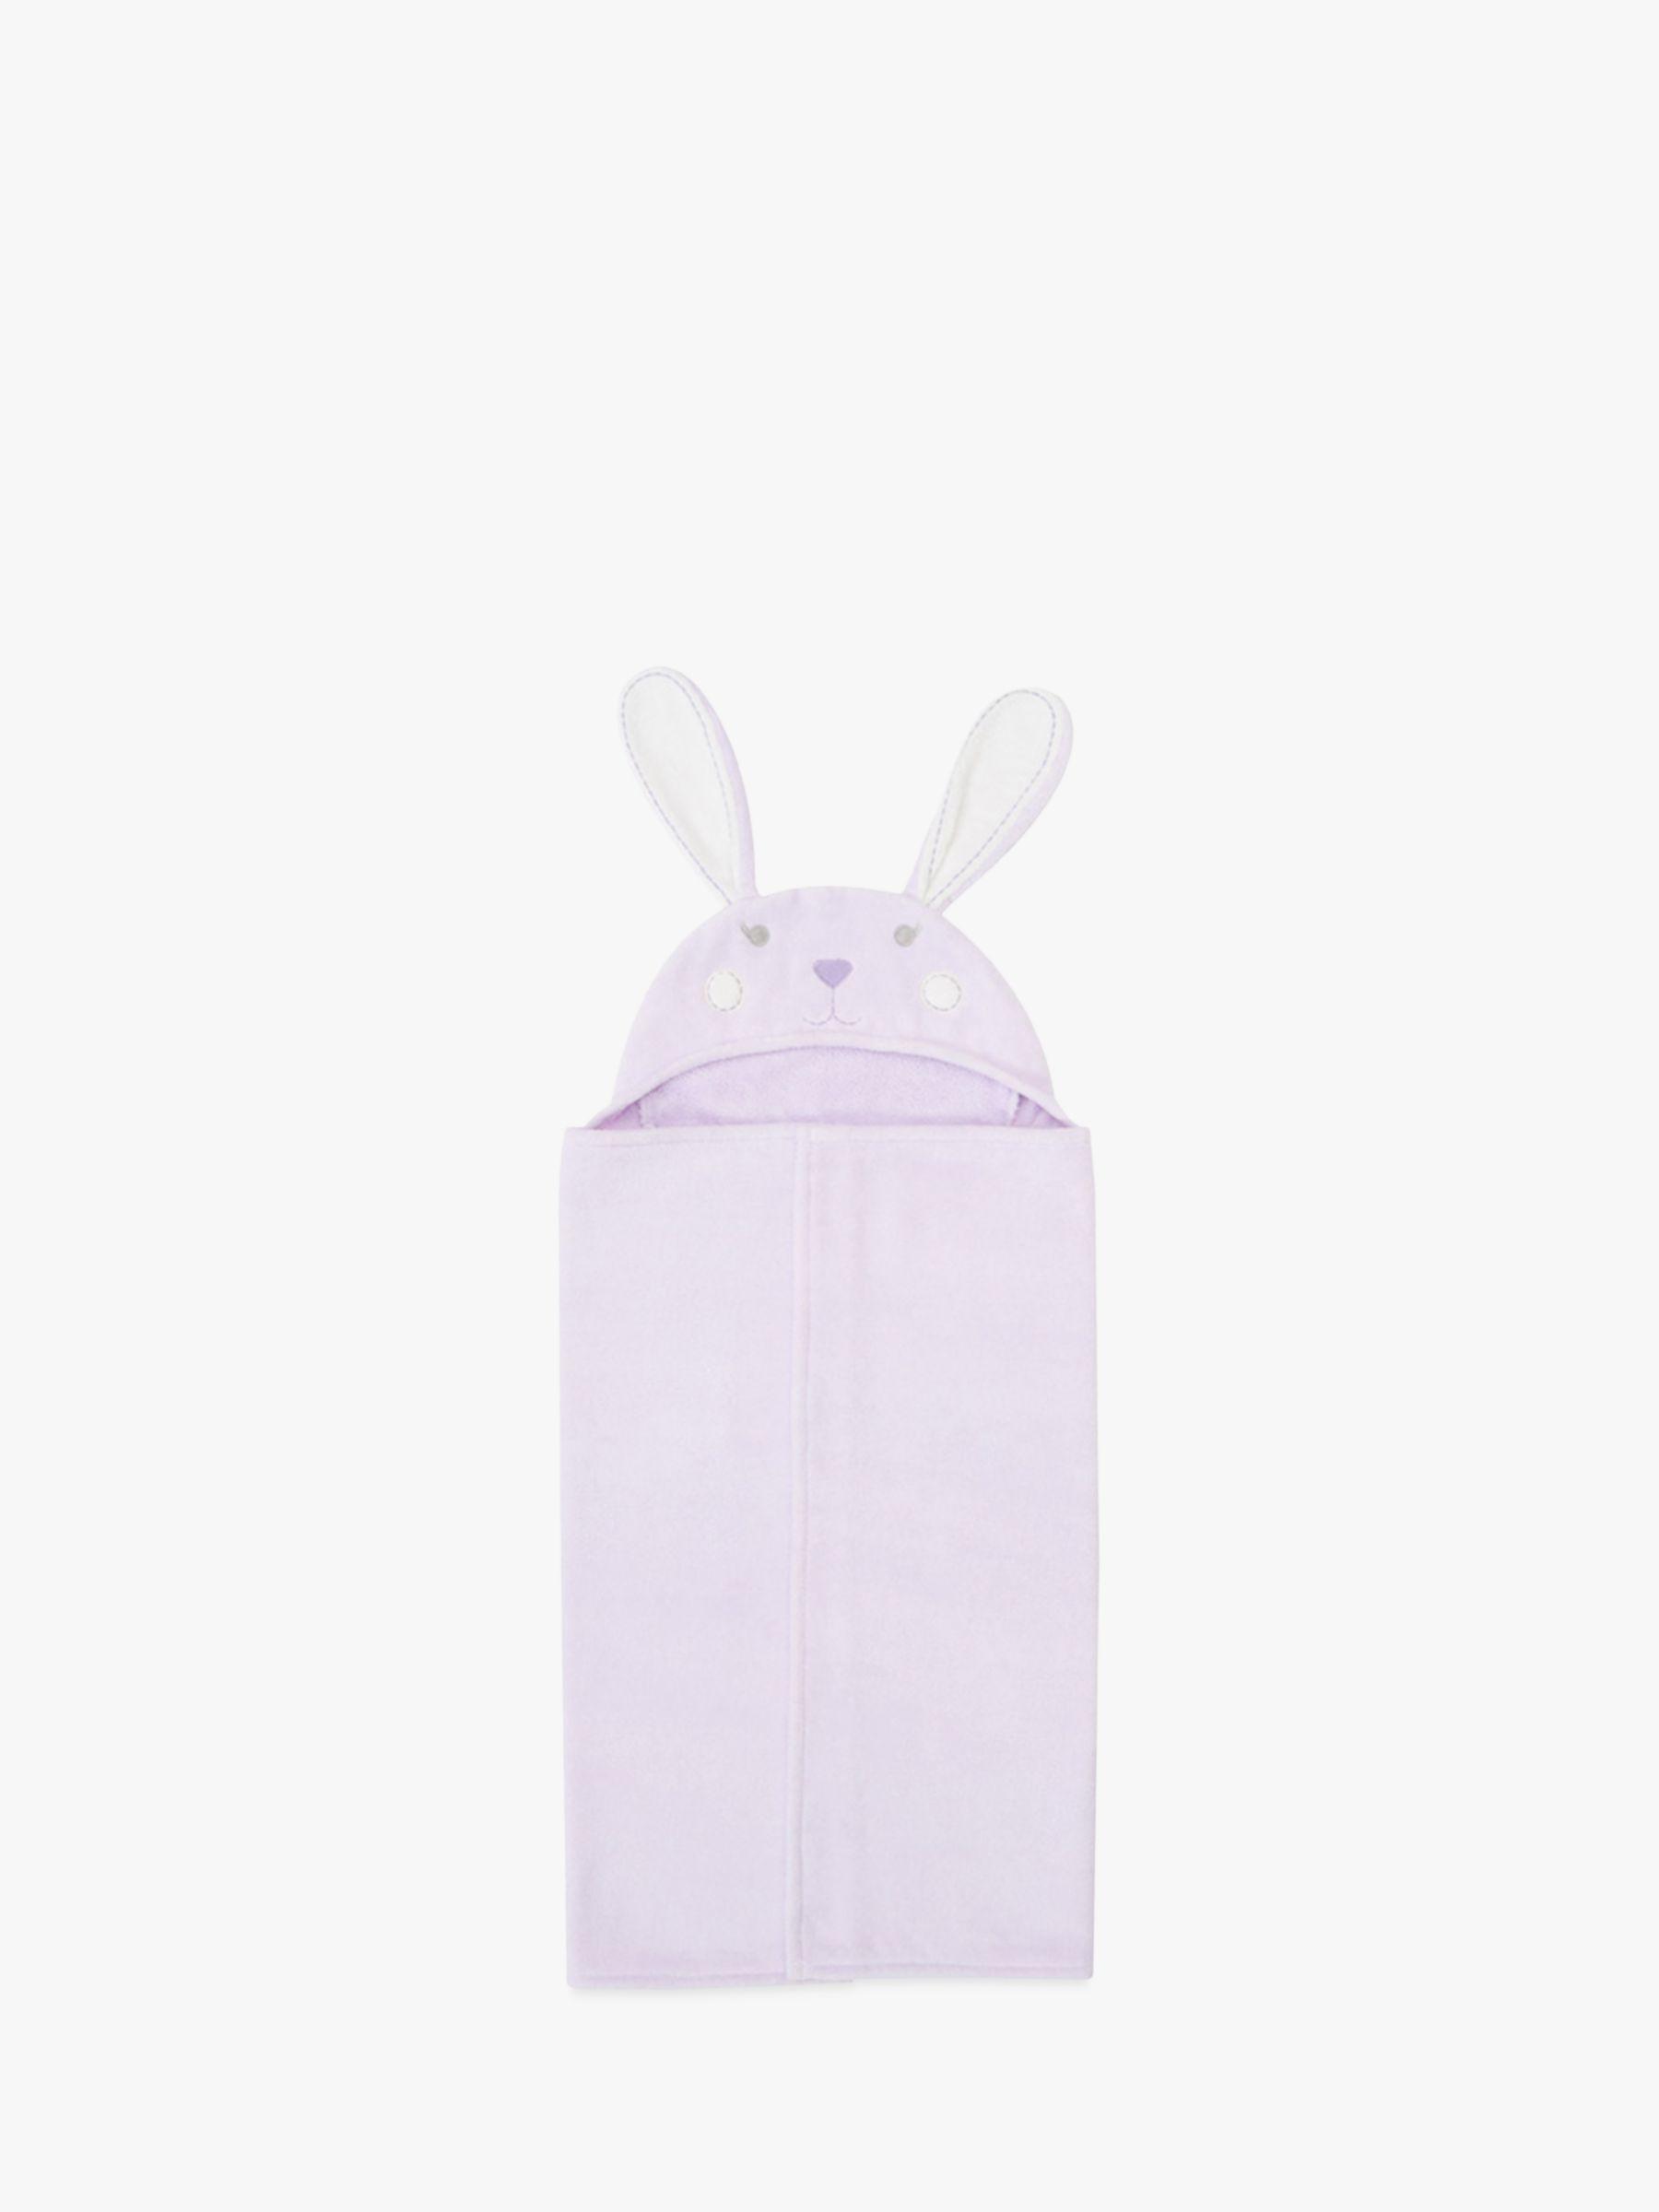 Pottery Barn Kids Bunny Critter Hooded Bath Towel